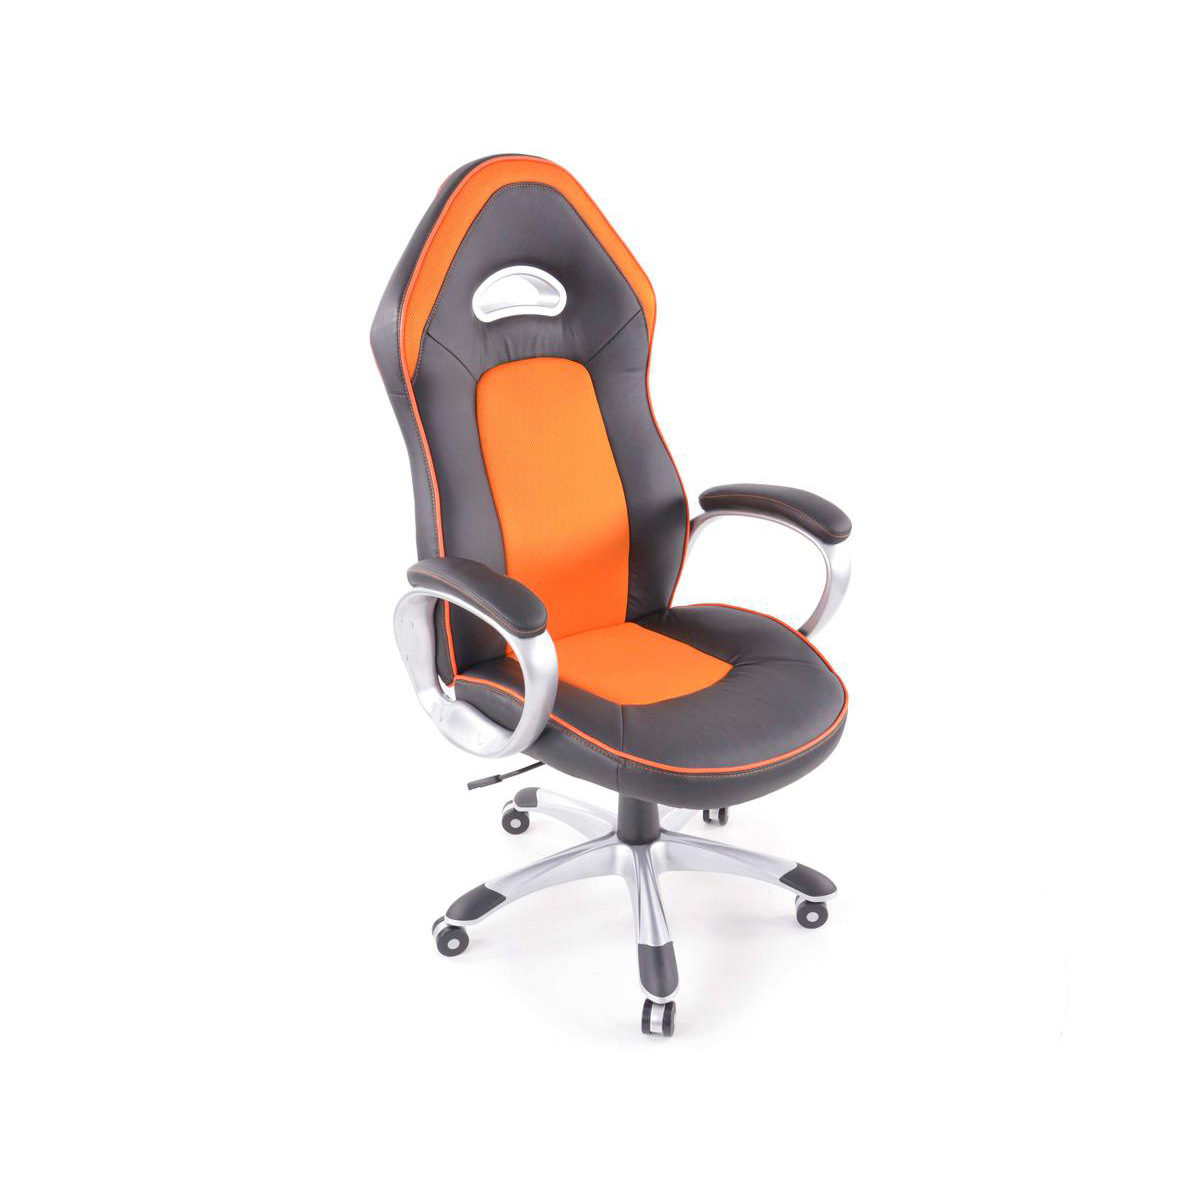 FK Automotive RX Racer BlackOrange Office Chair  GSM